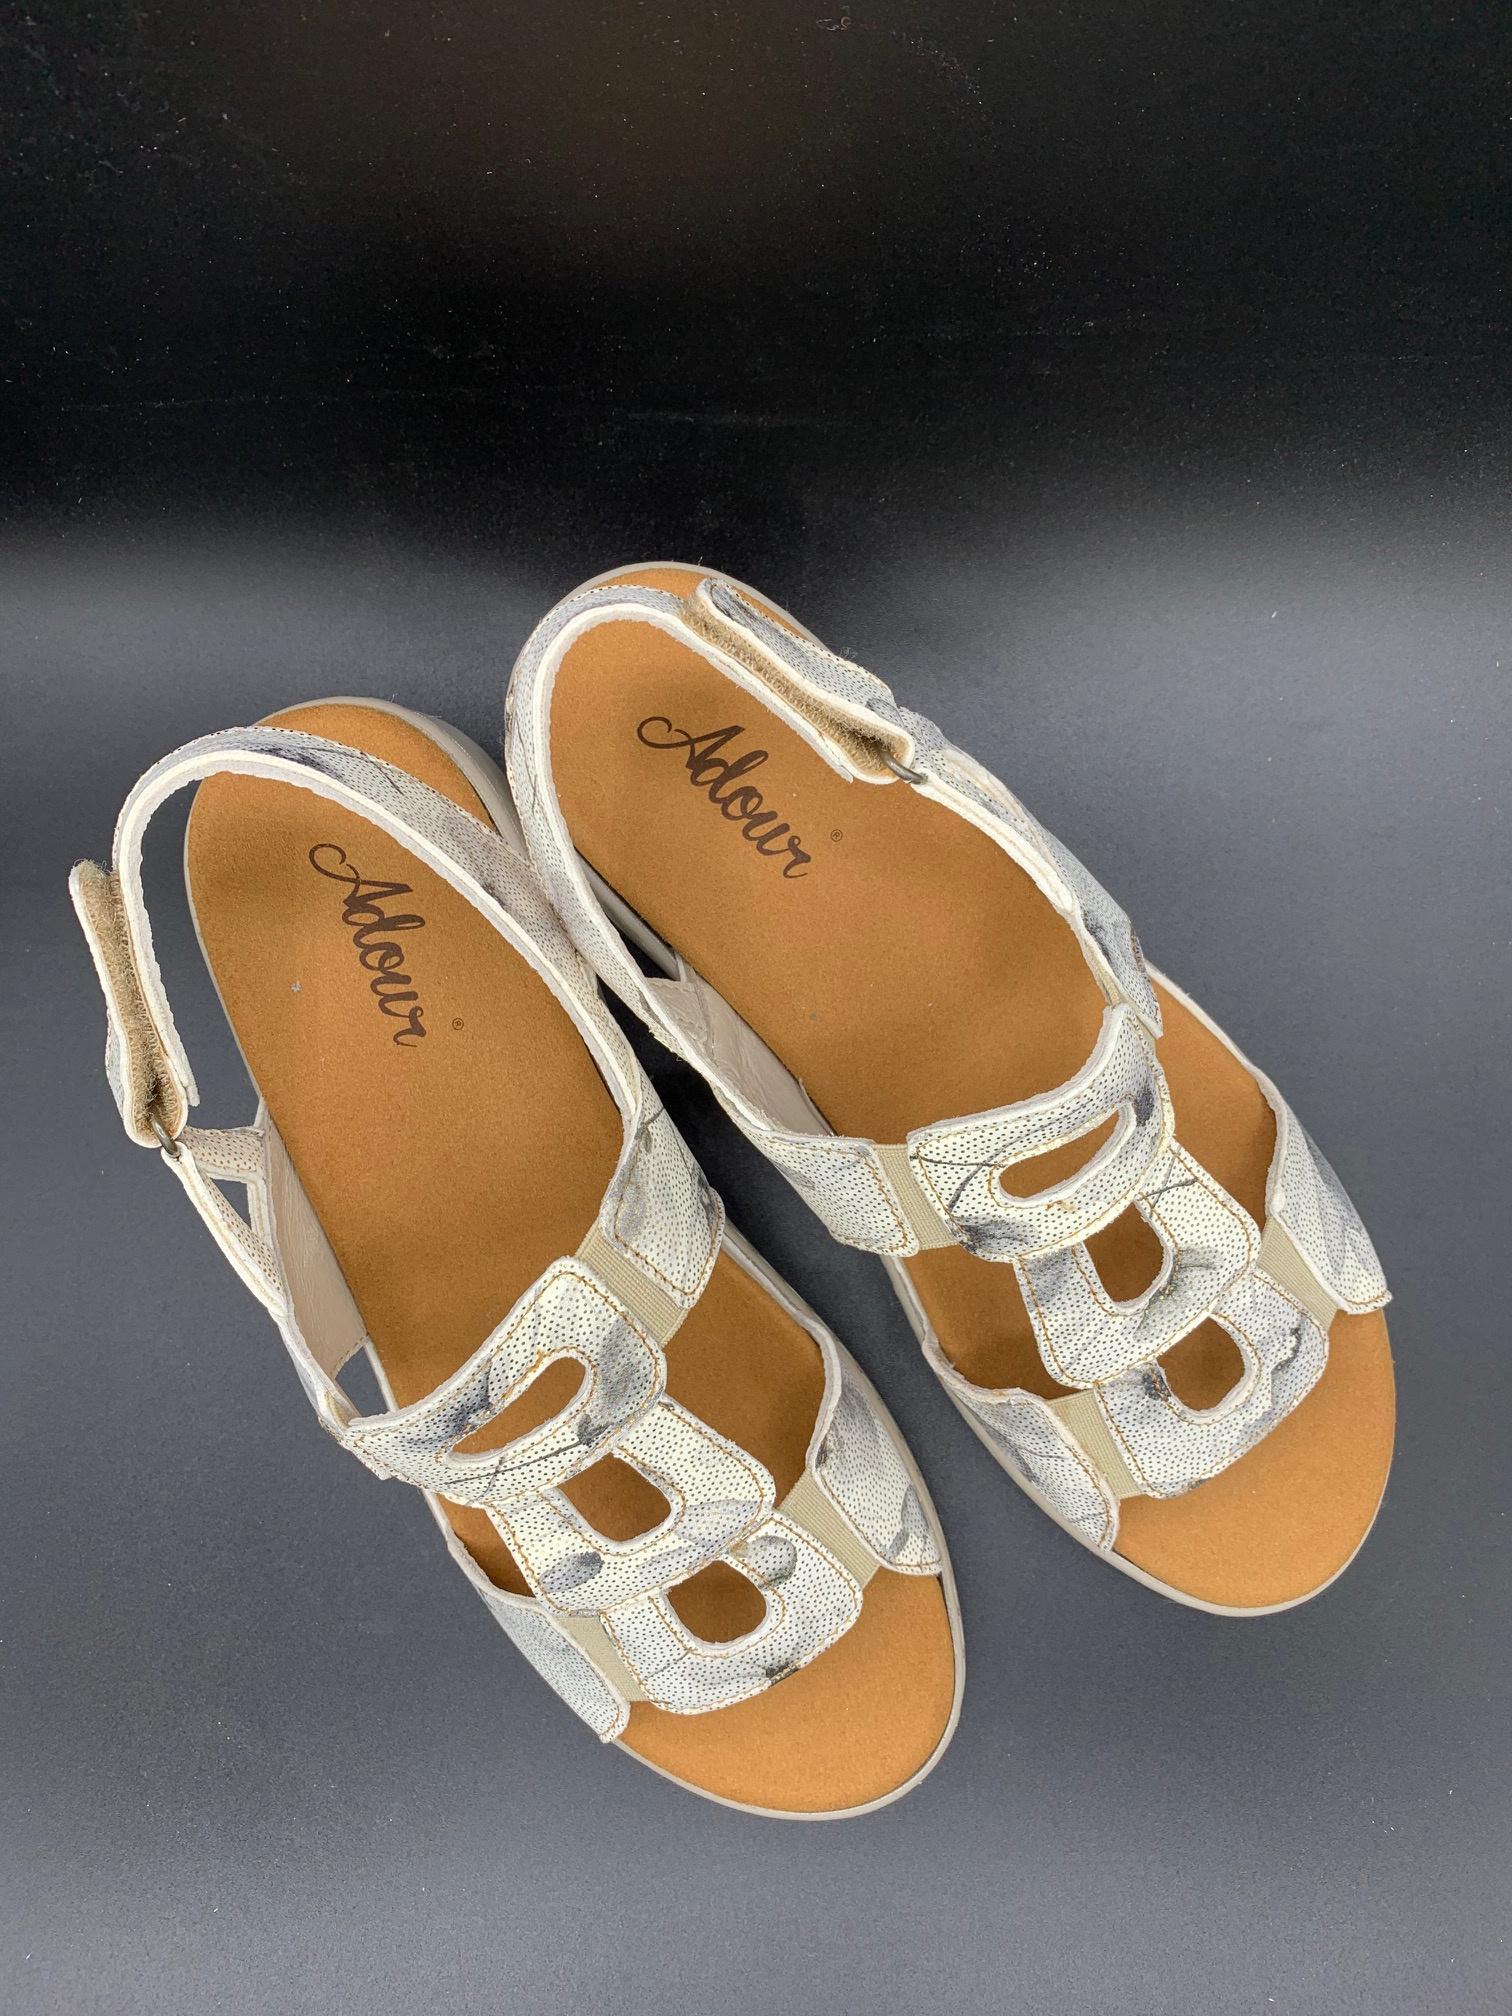 Chaussures médicales CHUT femme AD 2368(1)- Alpha medical service calais